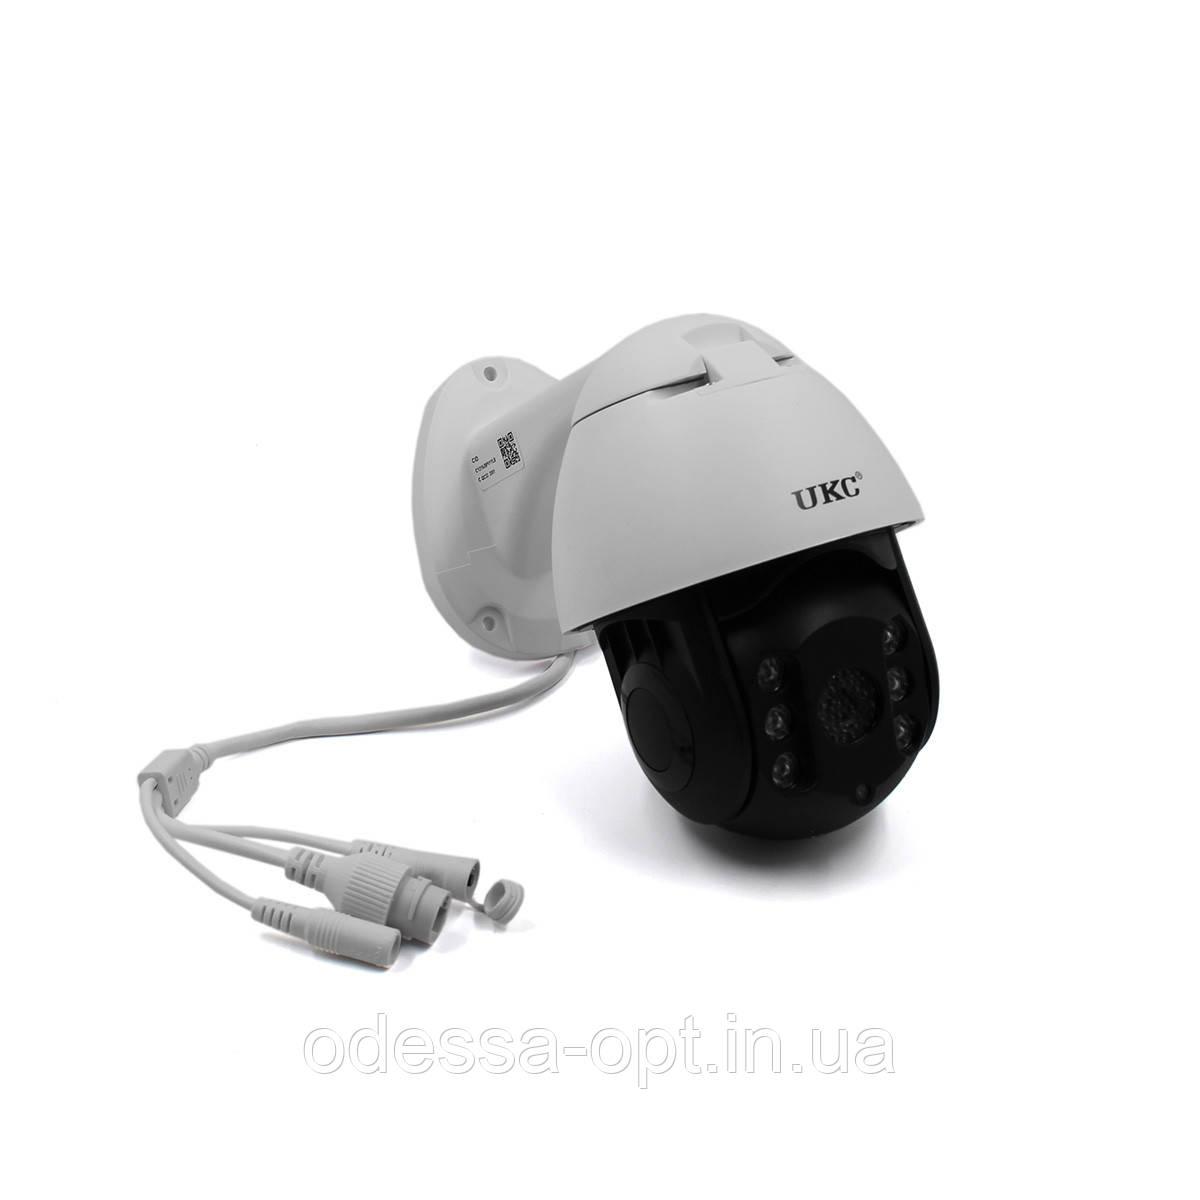 Камера CAMERA CAD 19HS WIFI 360/90 IP 2.0mp уличная